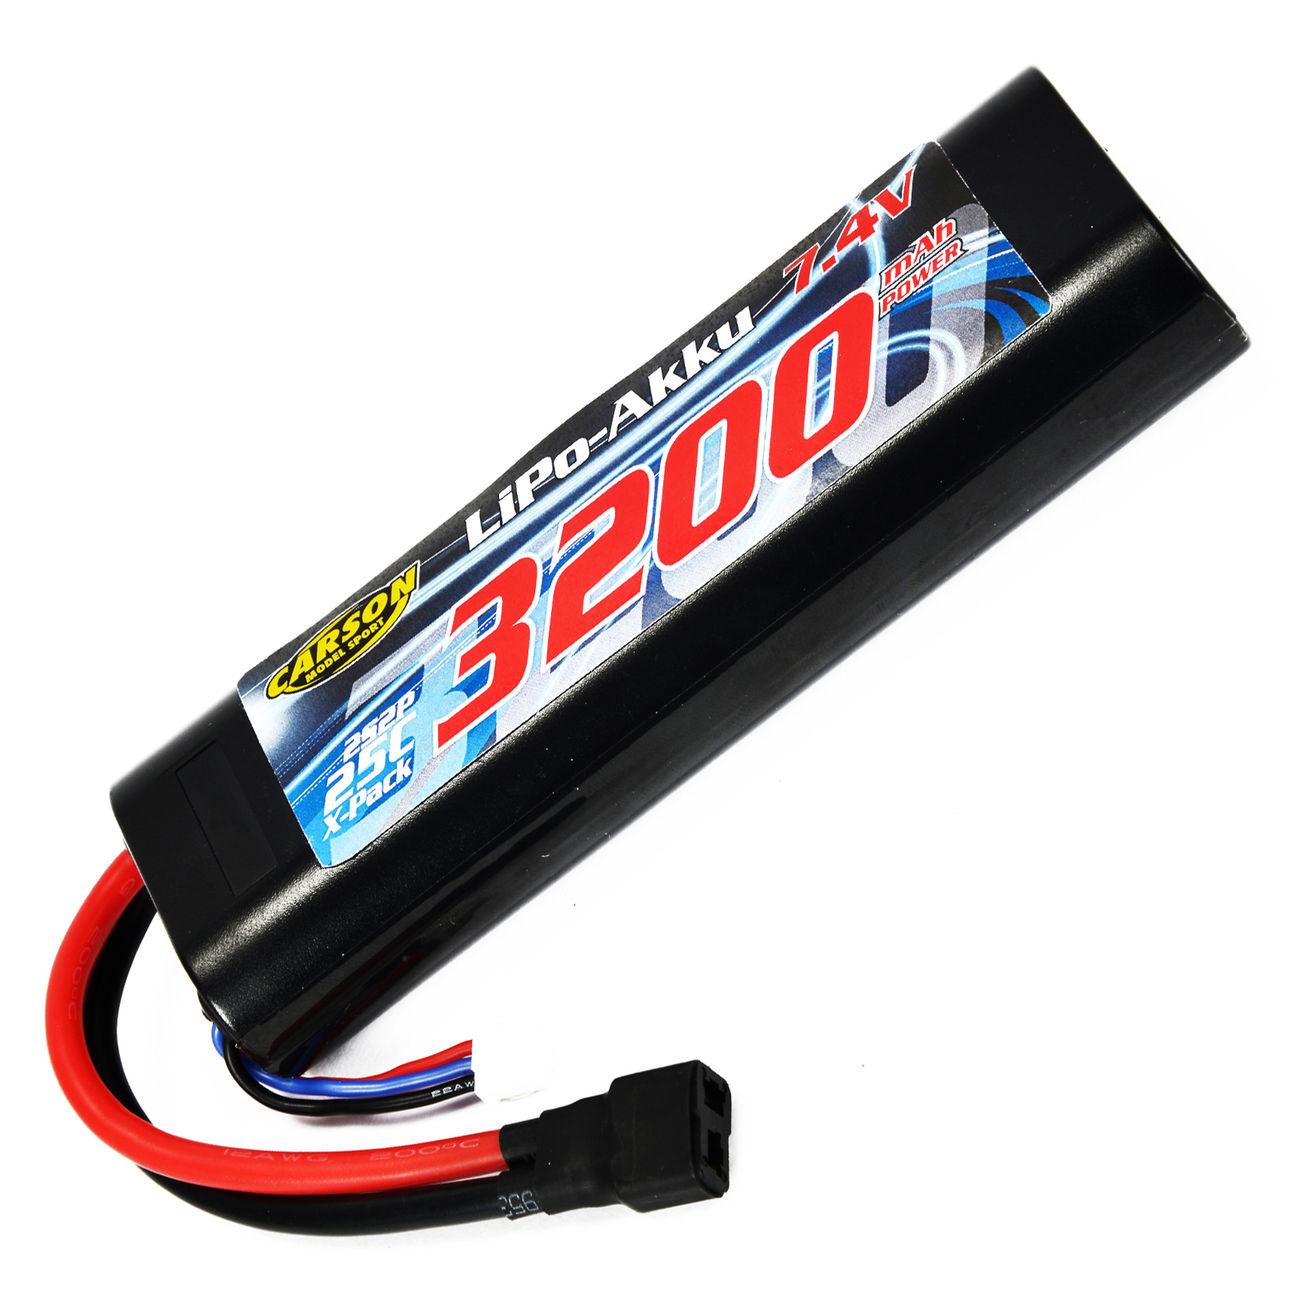 Carson lipo akku 7 4v 3200mah 25c racing pack t stecker for Lipo schreibtisch